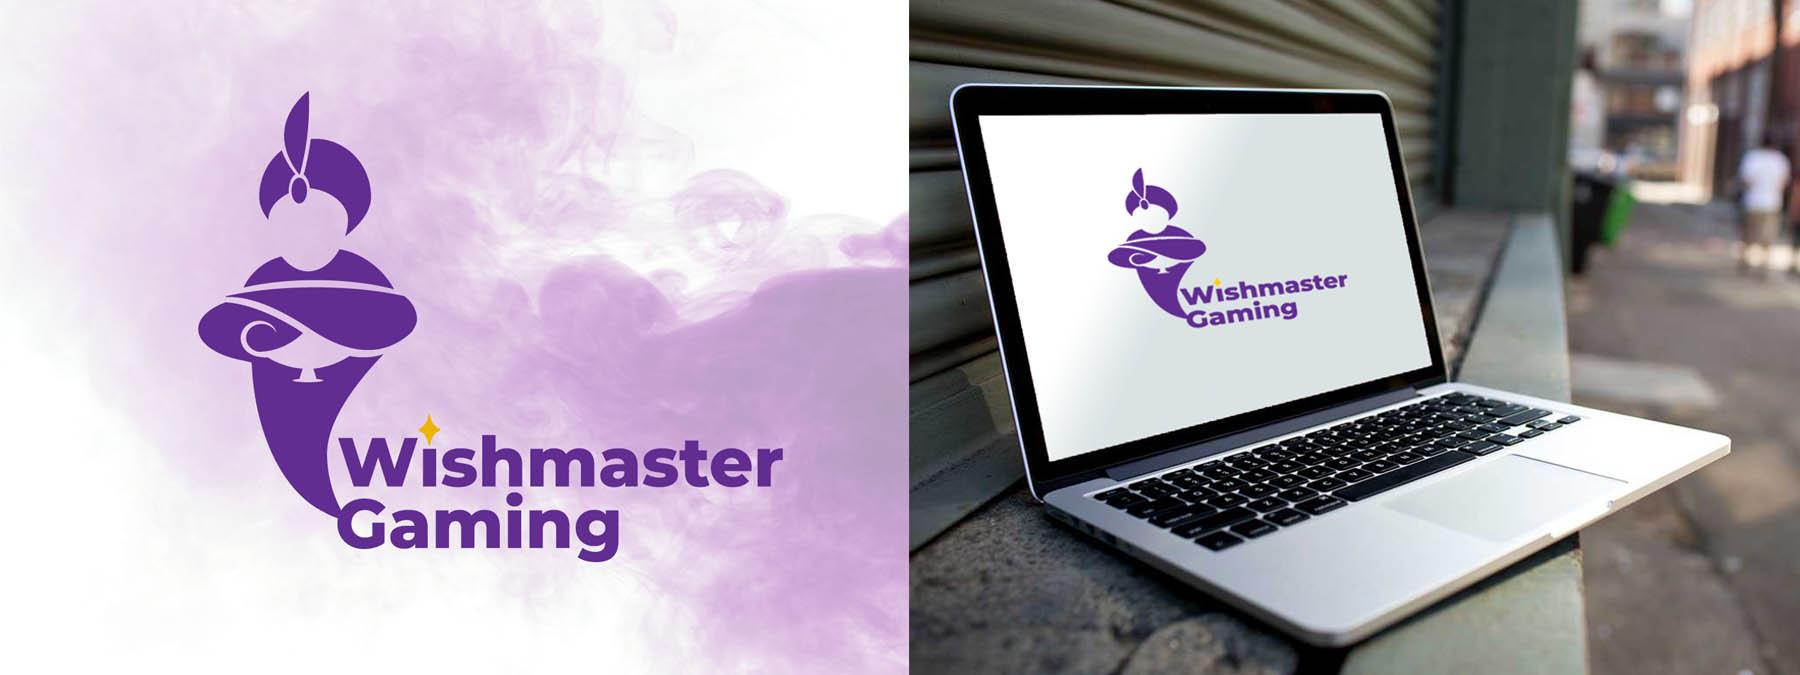 Wishmater gaming logo banner.jpg